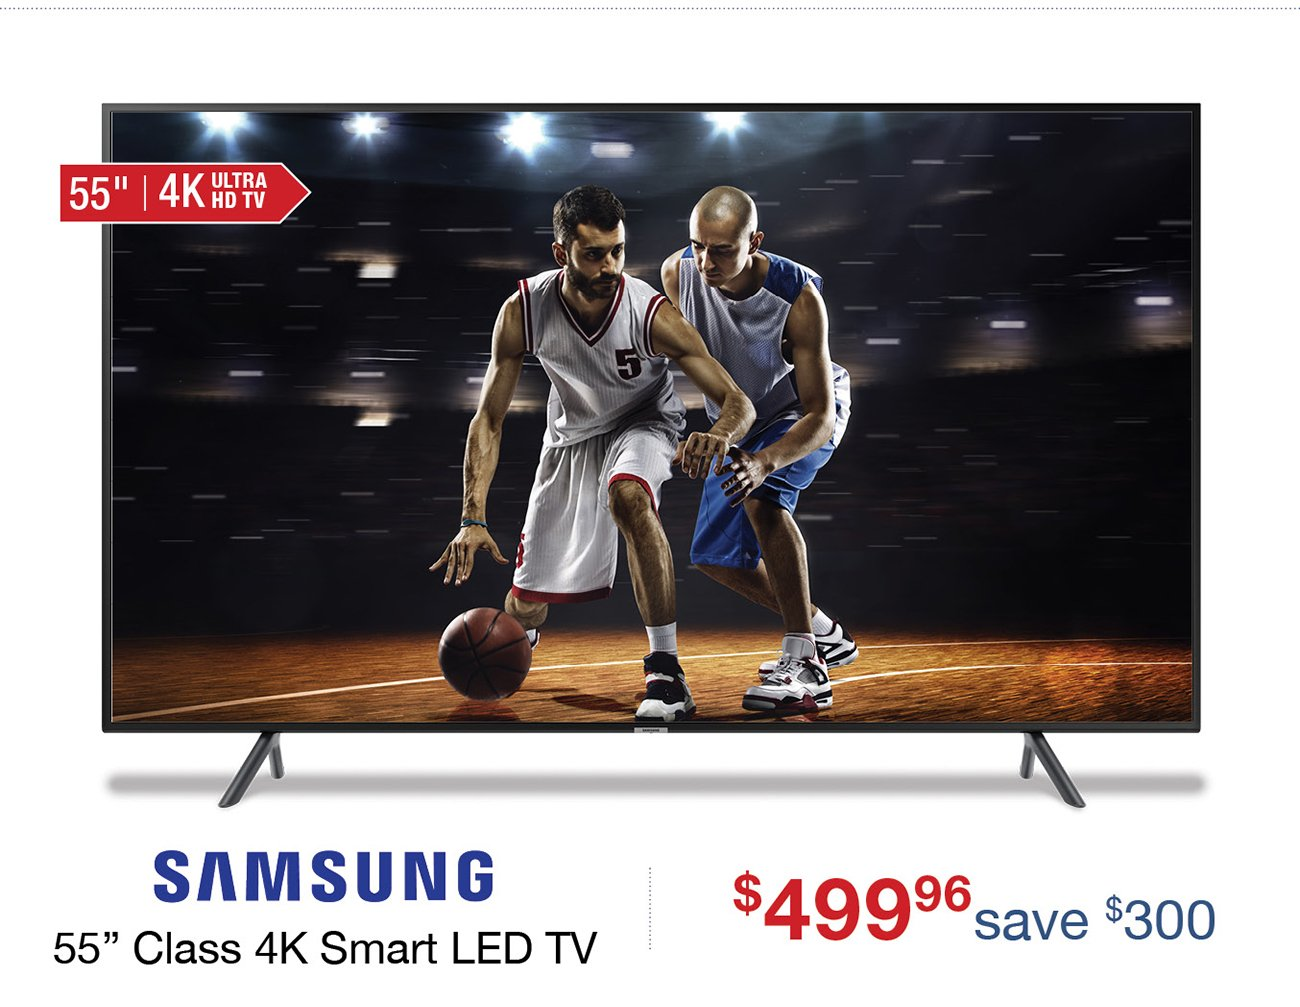 Samsung-55-inch-4k-tv